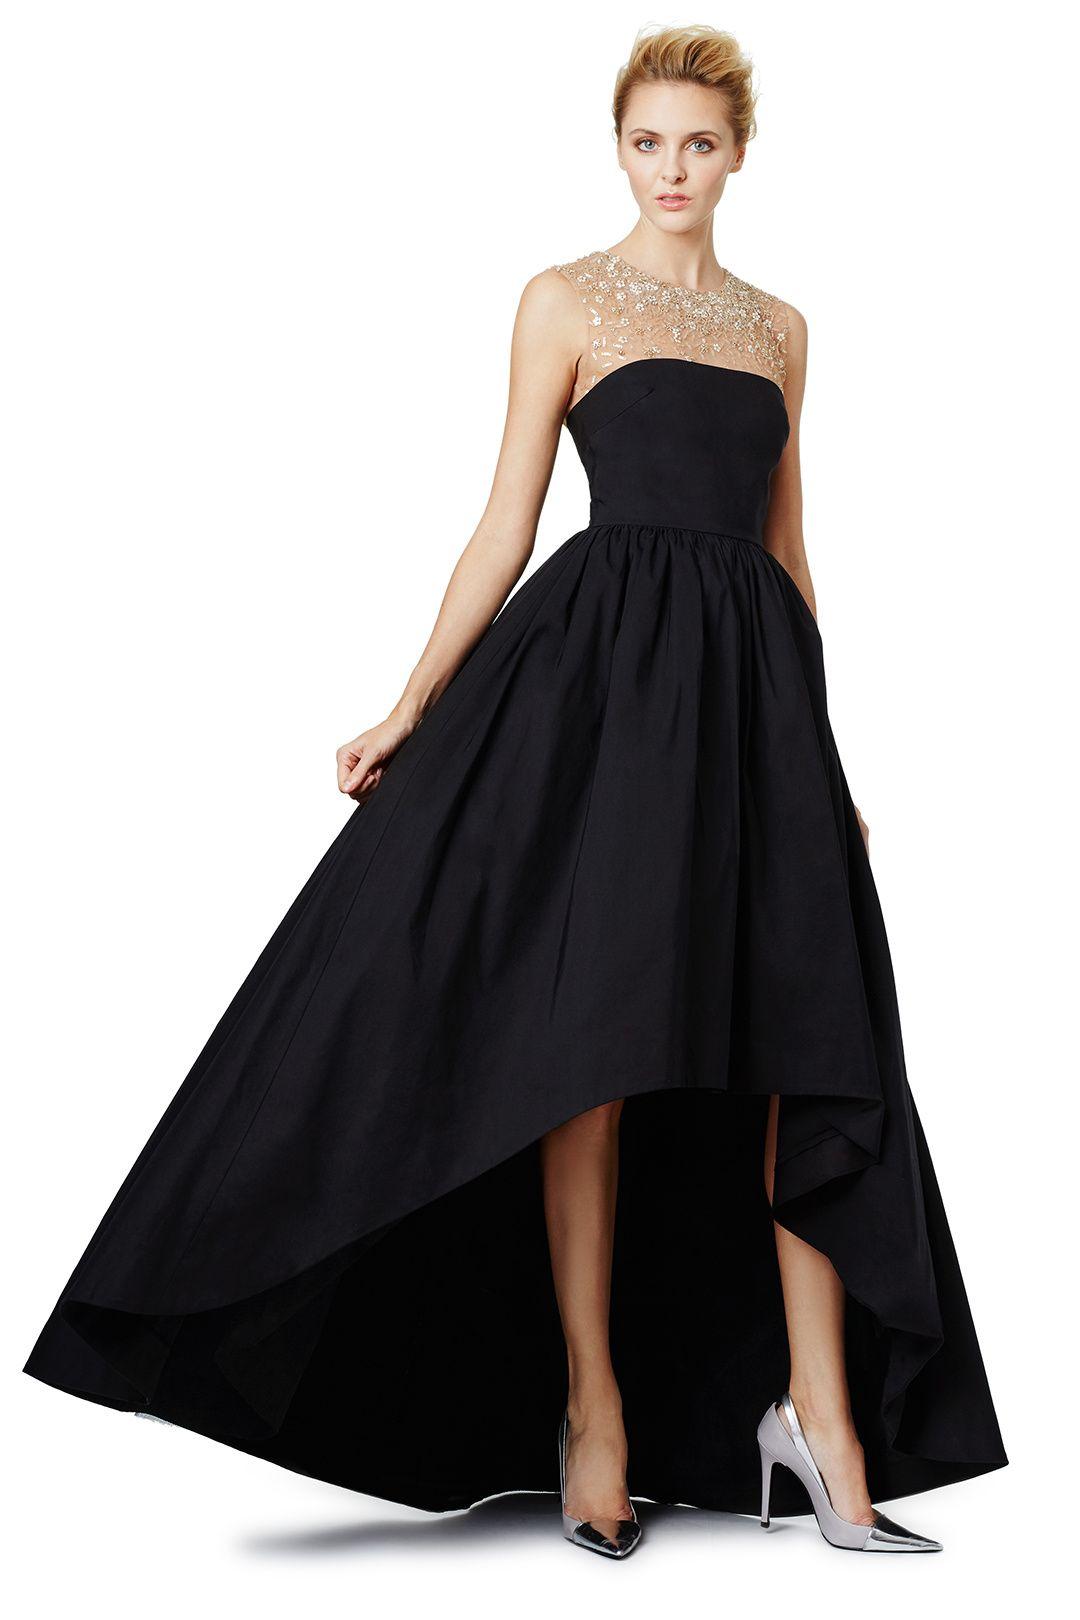 Marchesa Notte Precision Gown Black Tie Wedding Guest Dress Black Evening Dresses Summer Formal Dresses [ 1620 x 1080 Pixel ]